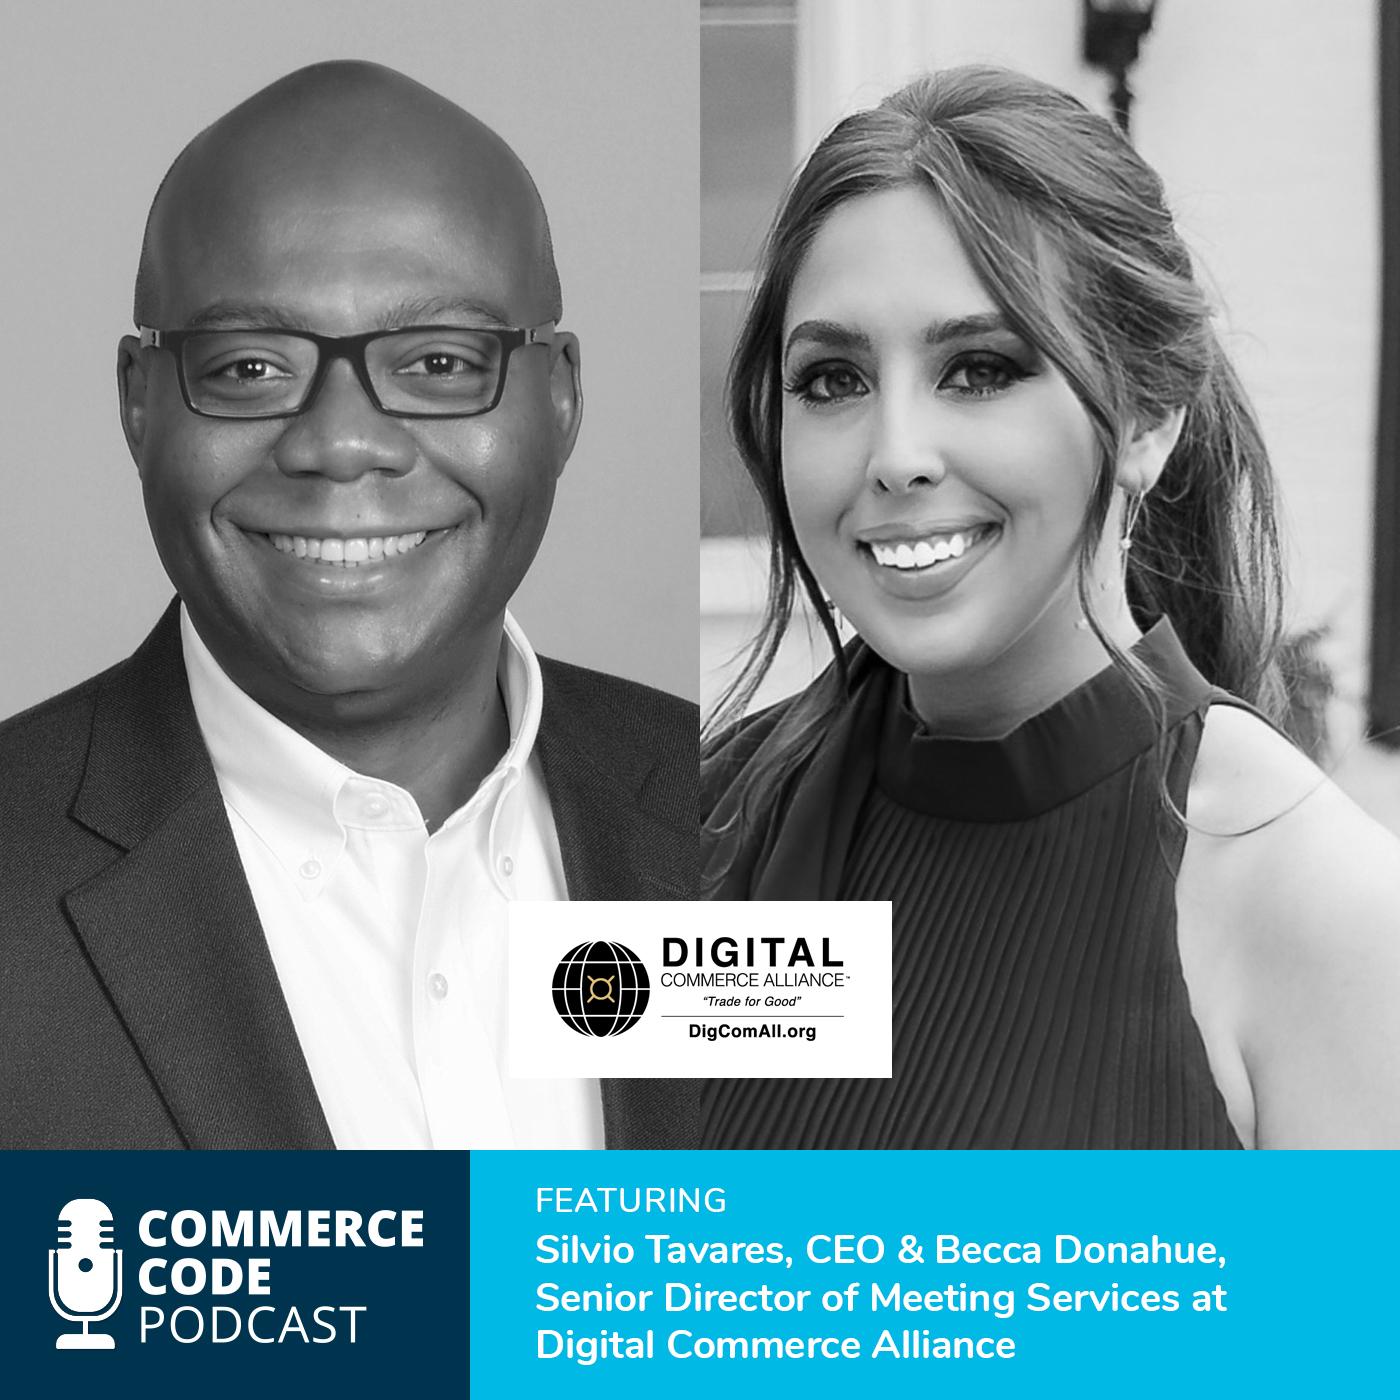 Silvio Tavares & Becca Donahue commercecode podcast